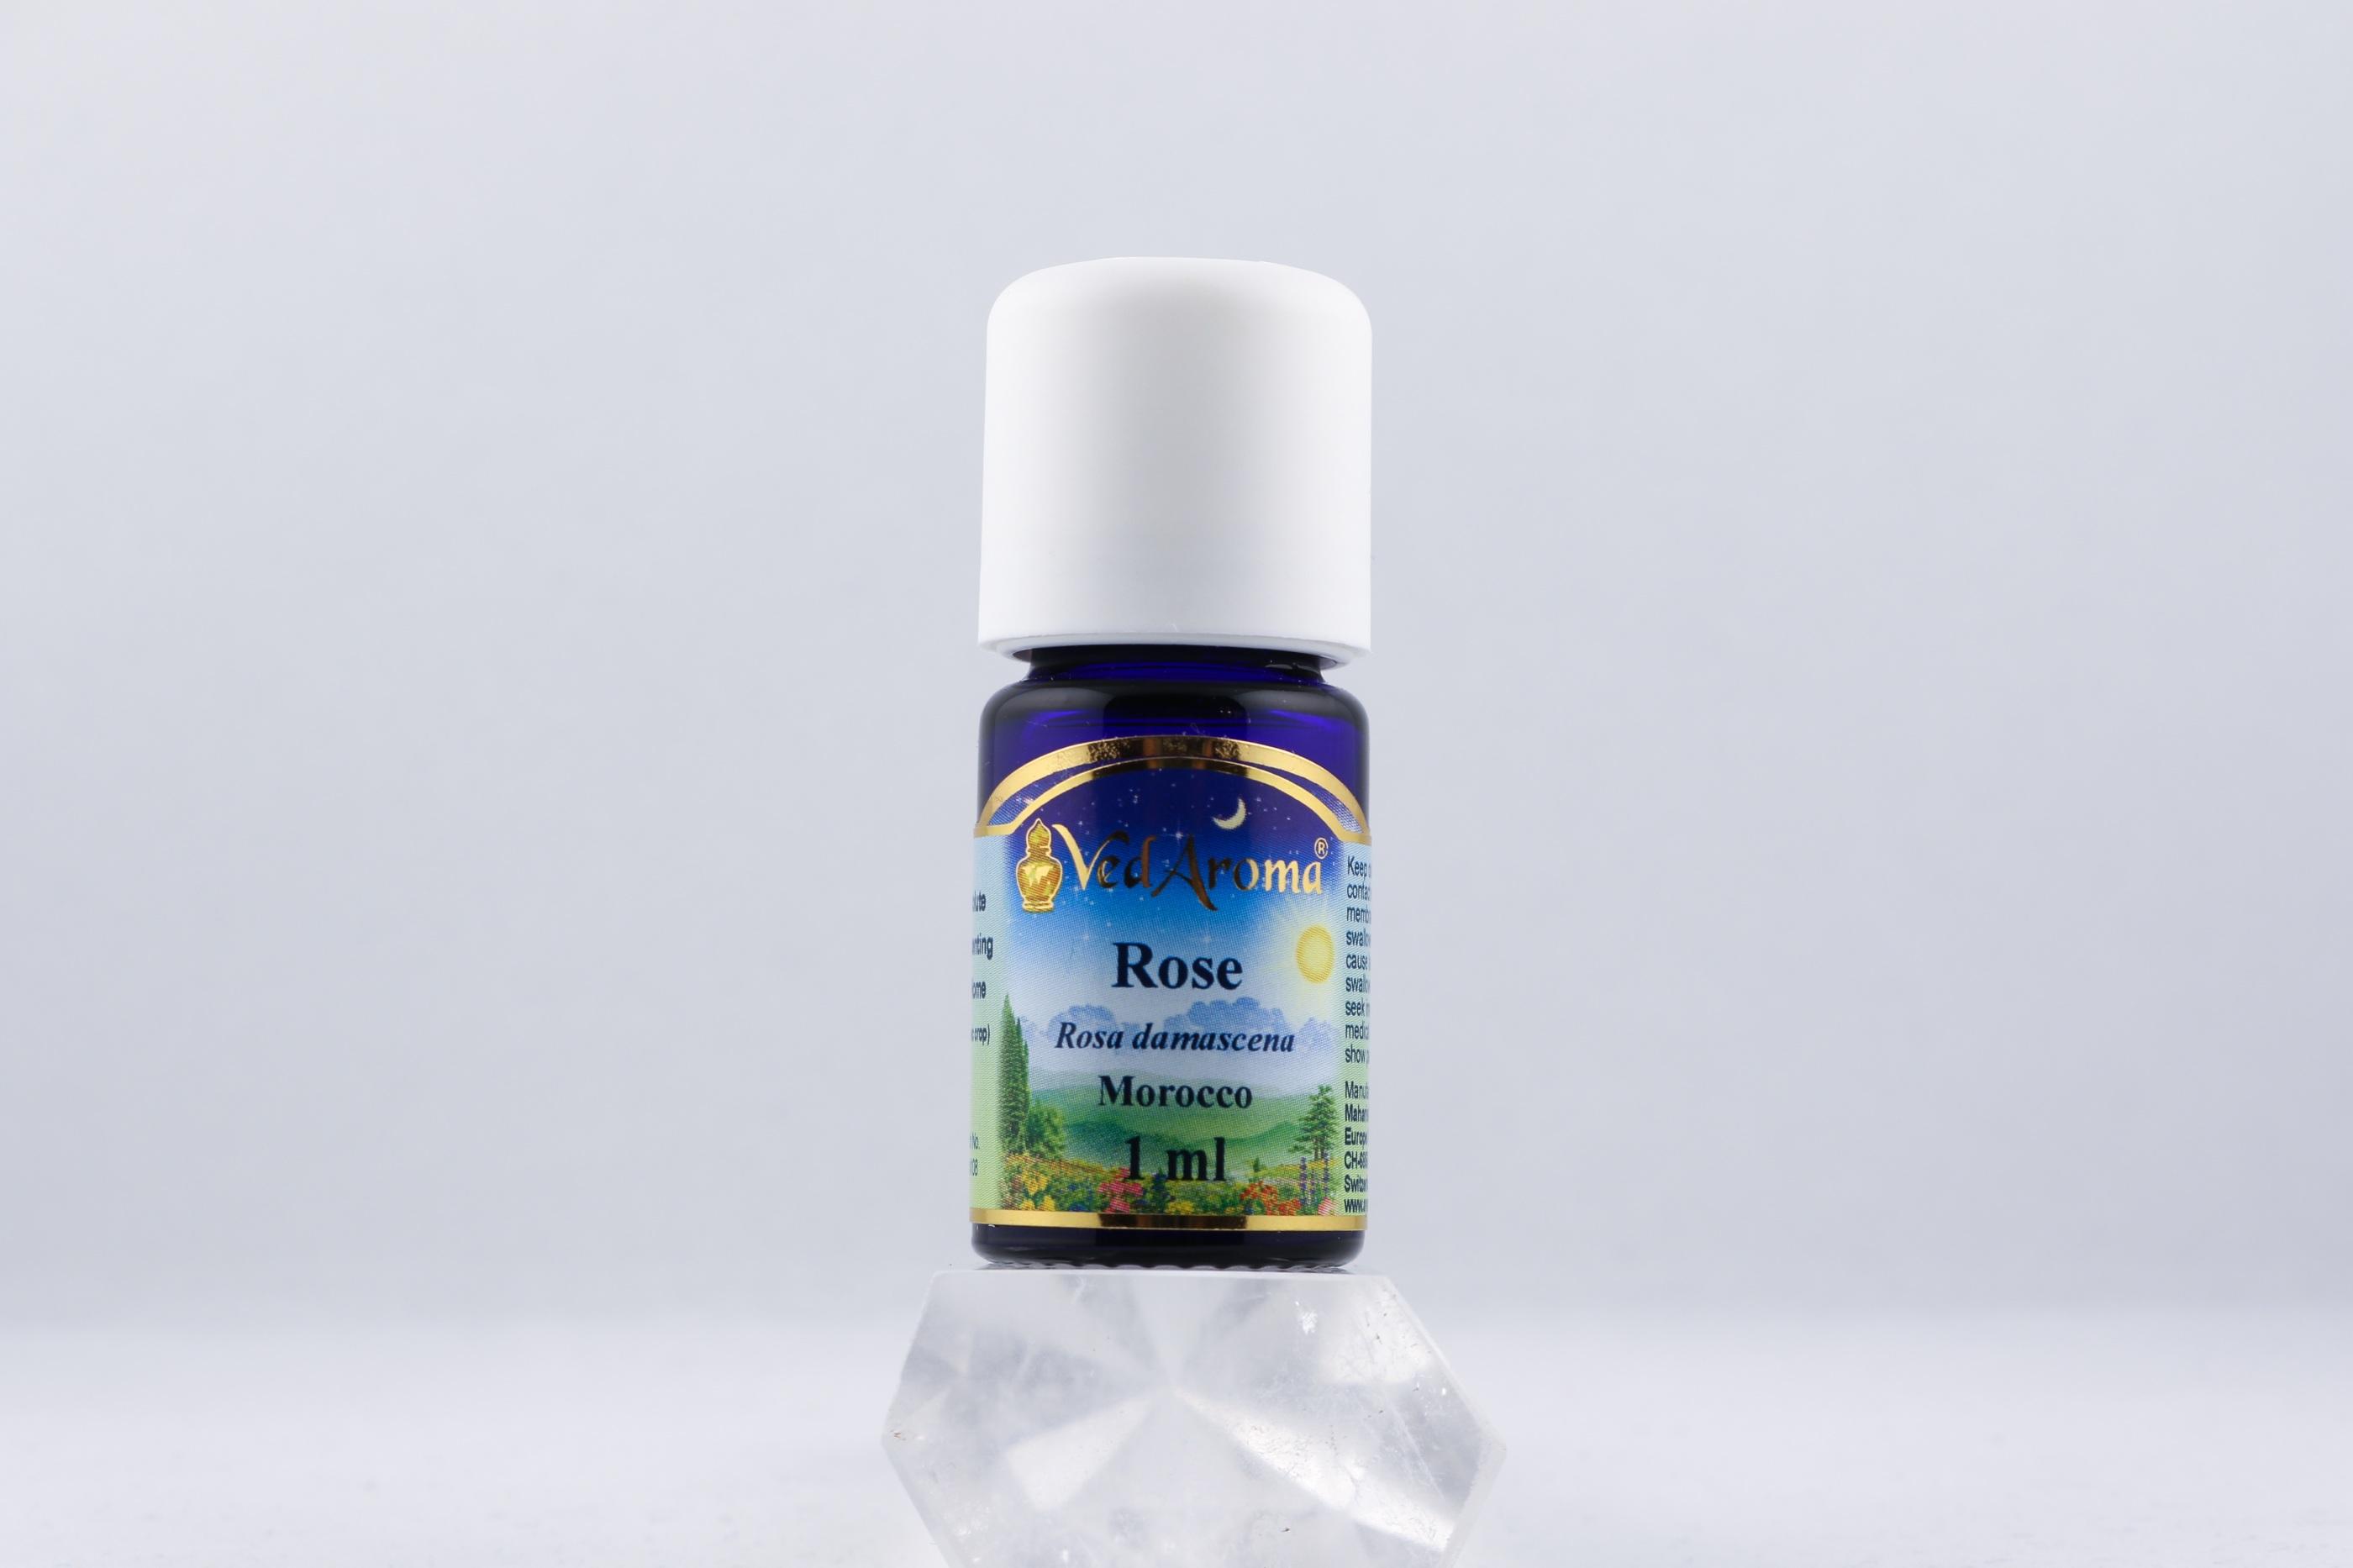 Ros olja wellness ayurveda halmstad sweden svensk eterisk aroma olja